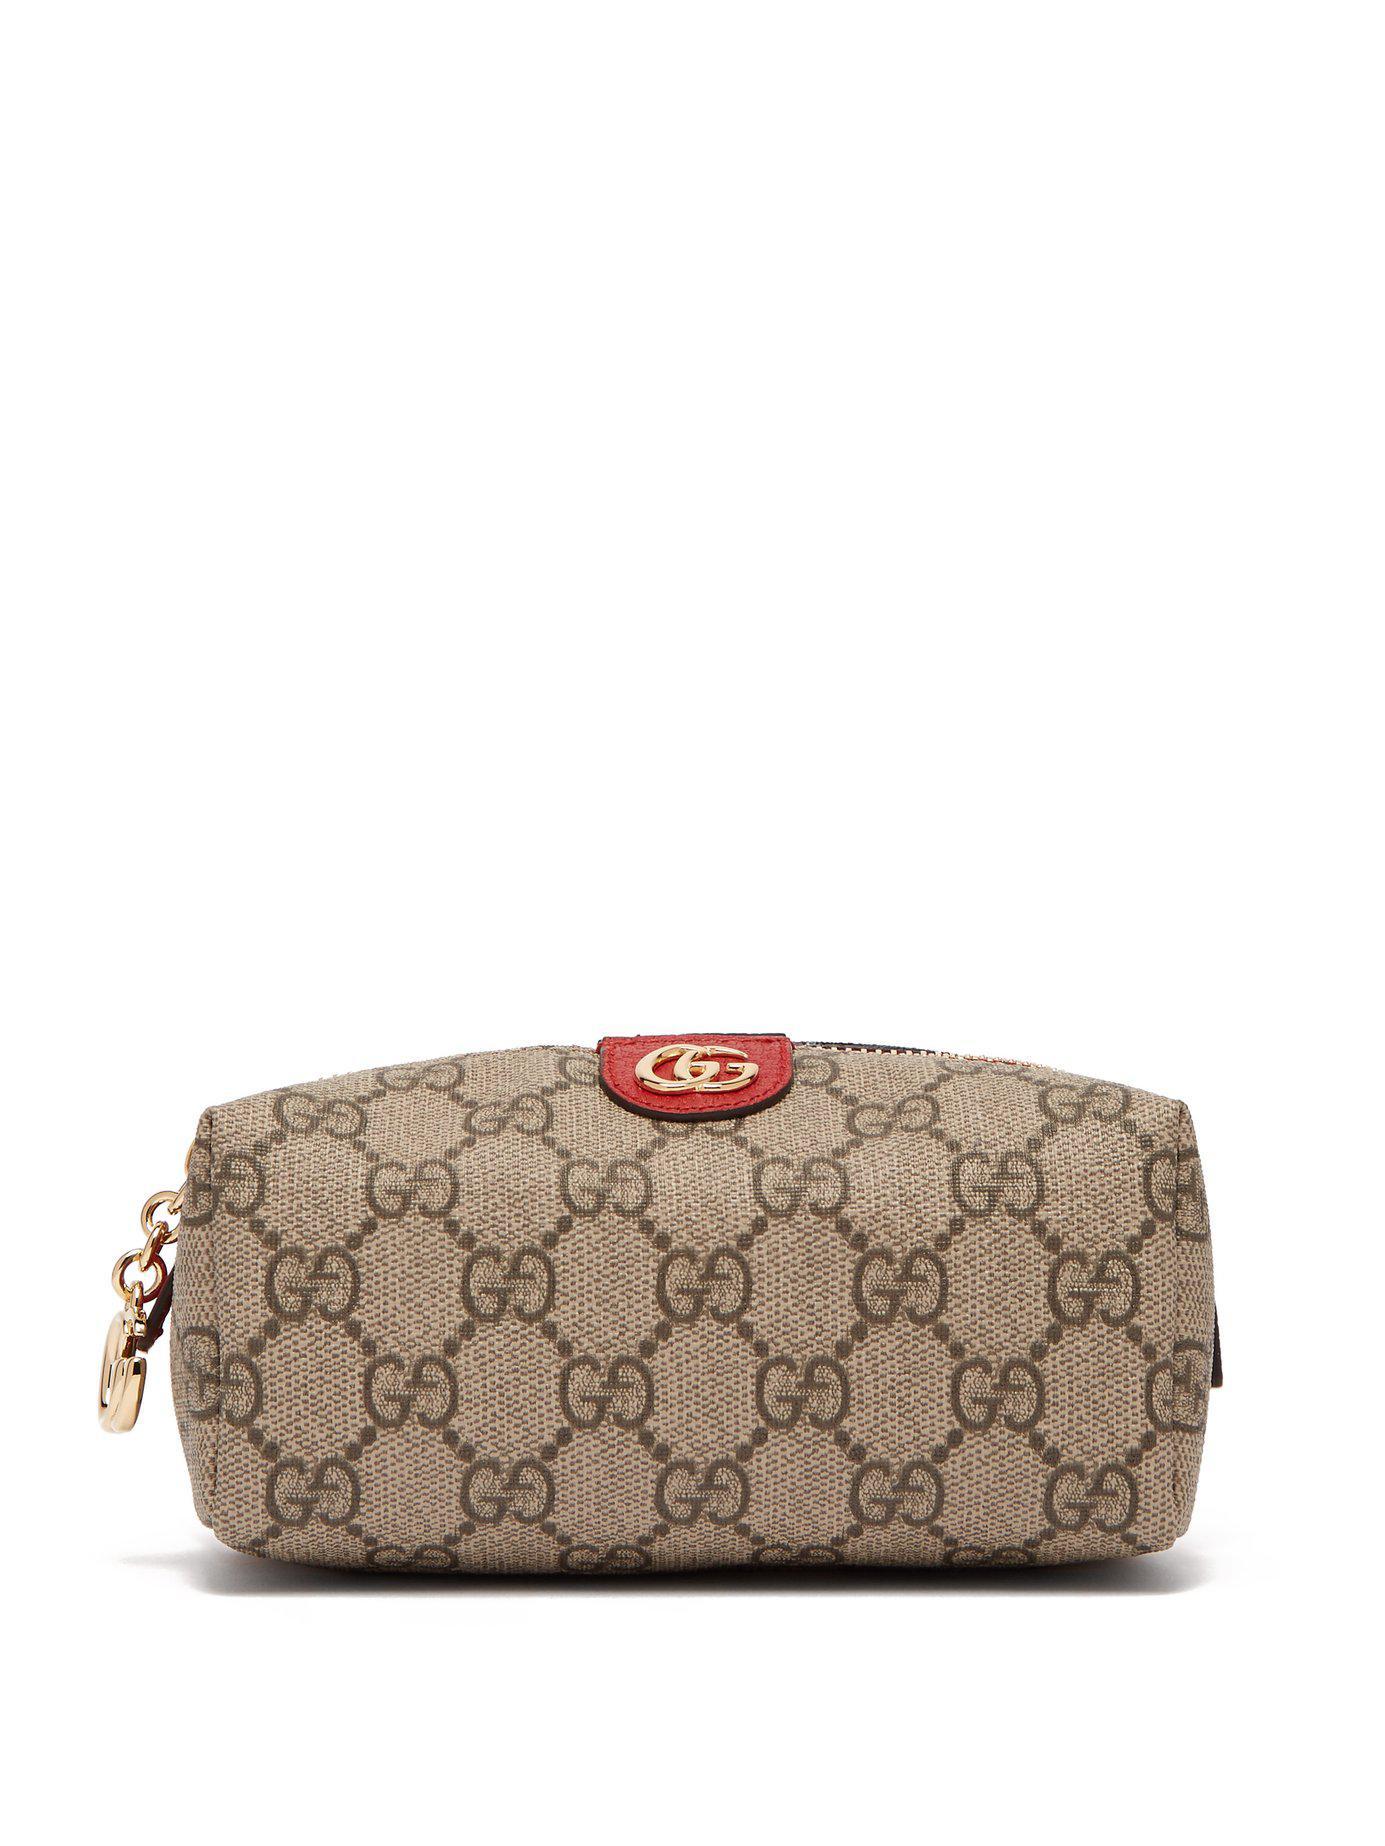 05d86610e73 Gucci. Women s Ophidia Gg Supreme Canvas Make Up Bag